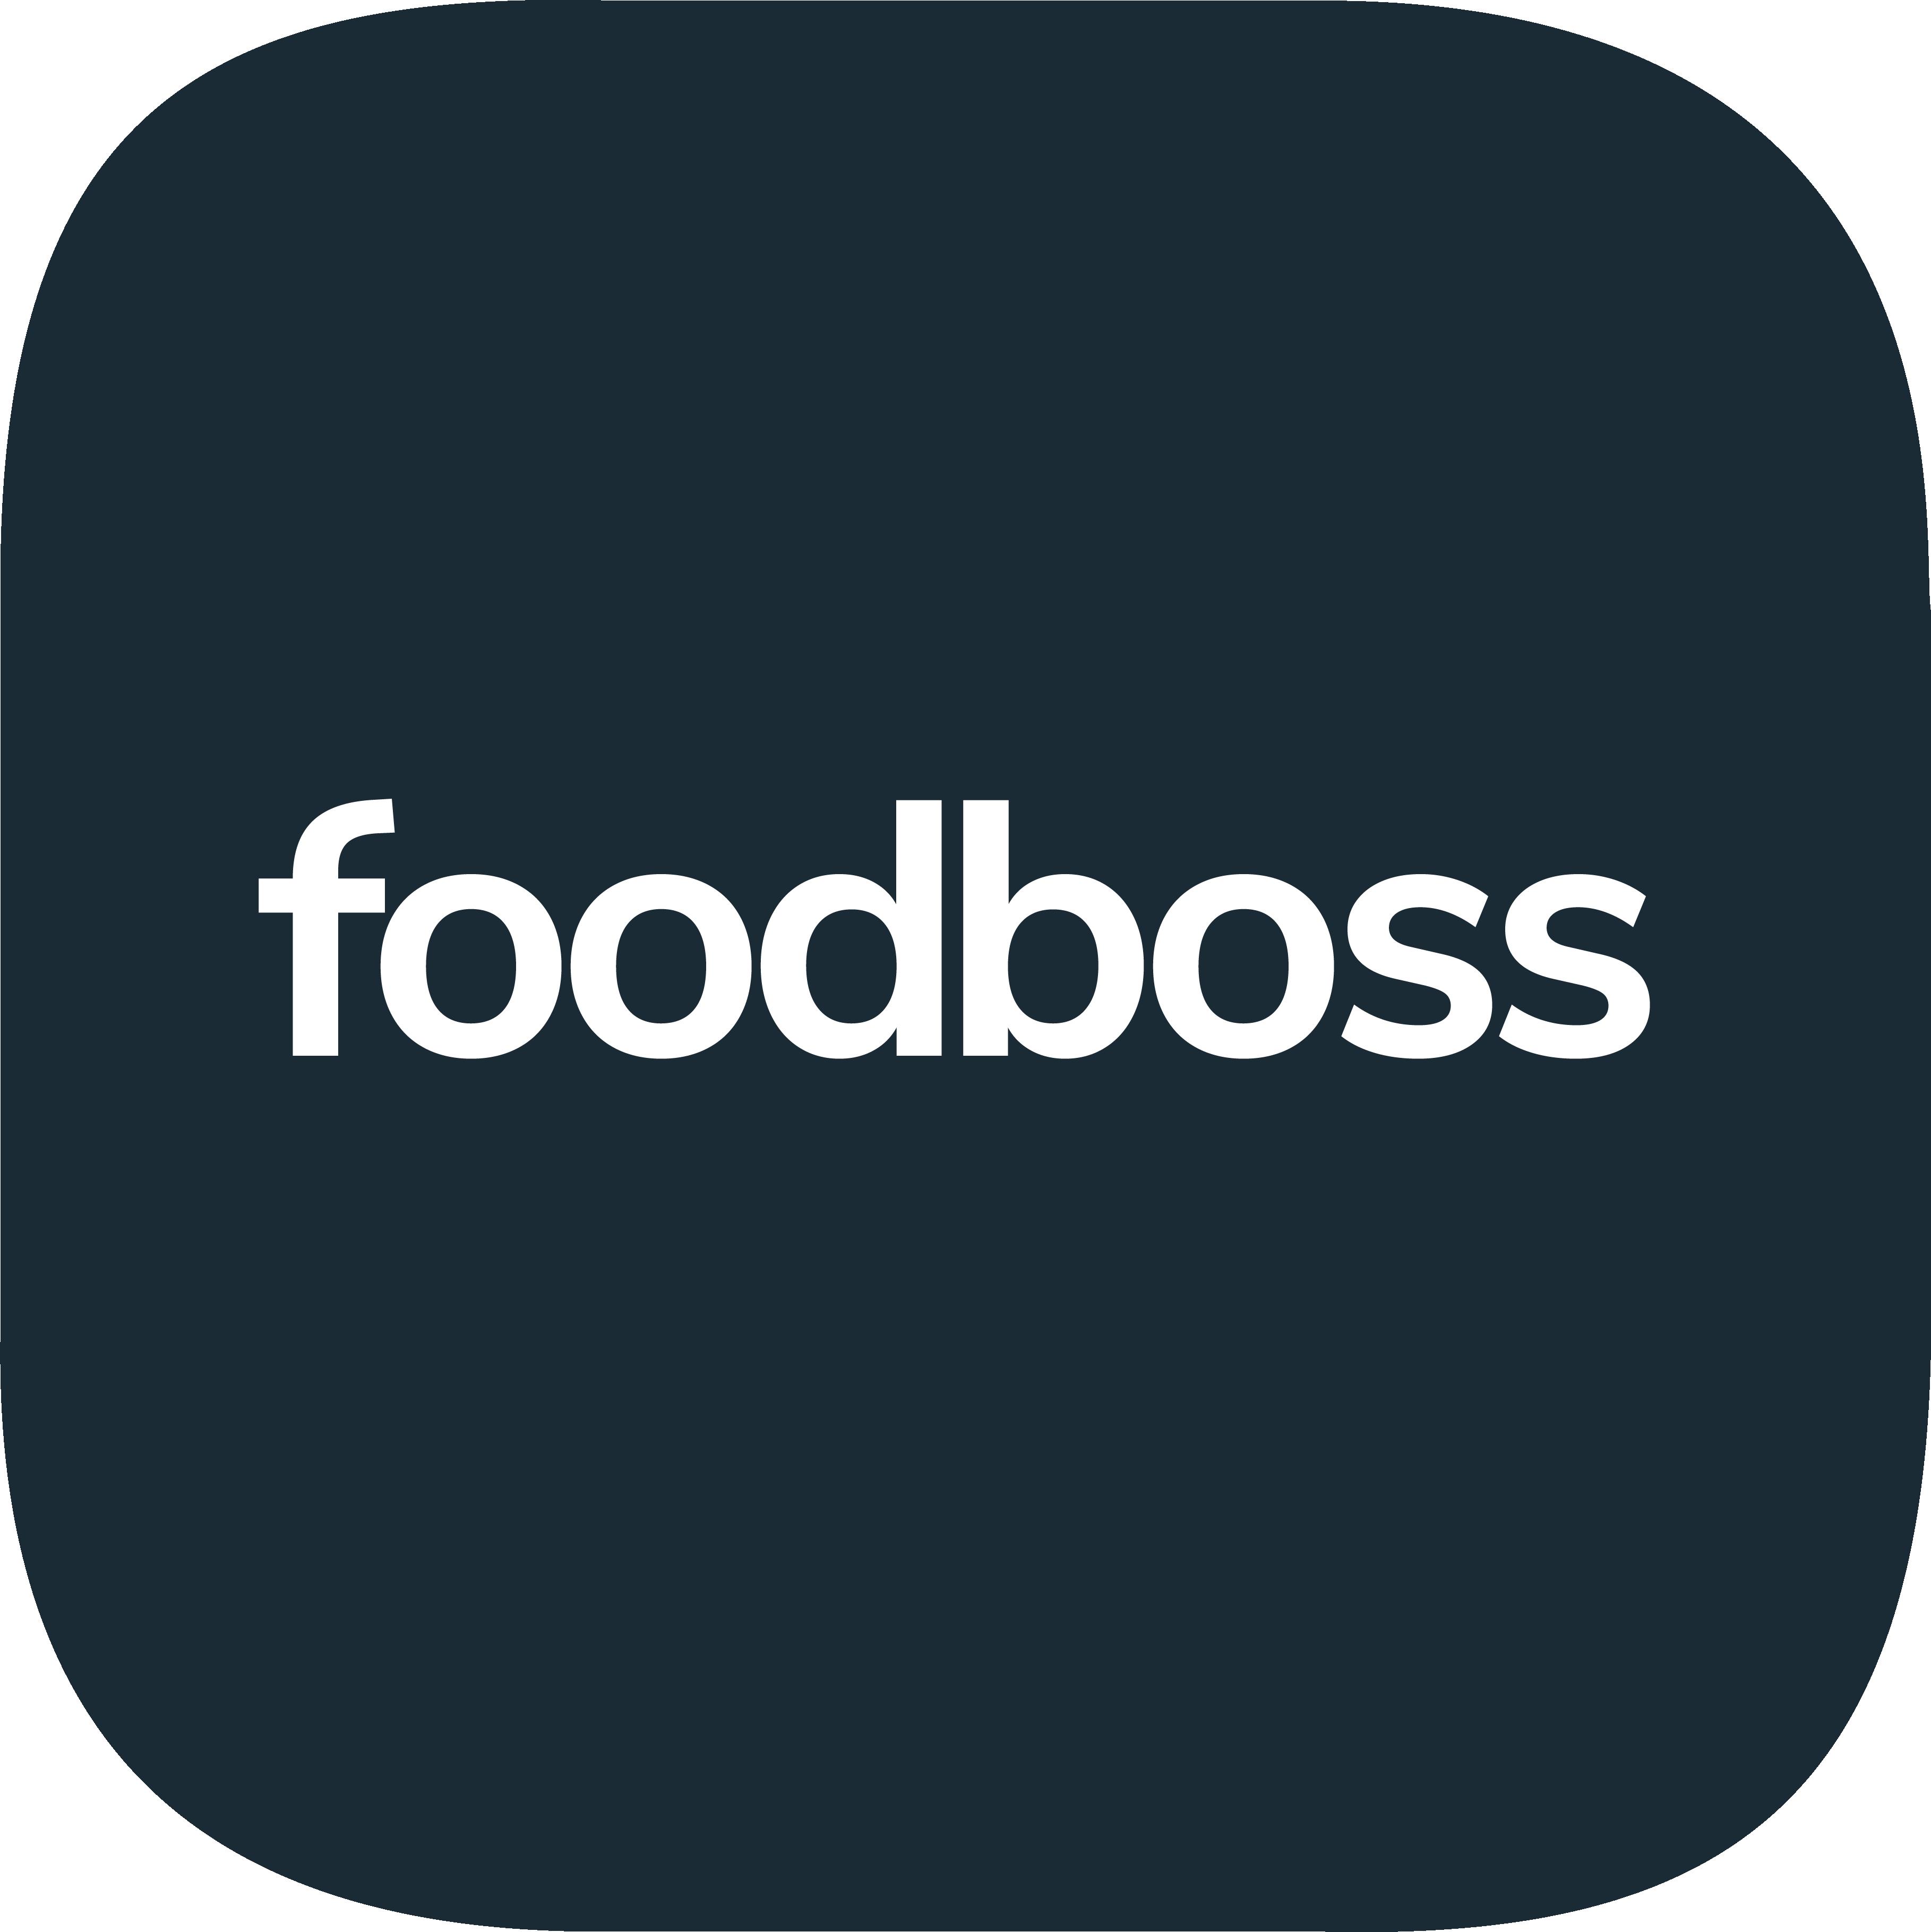 FoodBoss Marketing